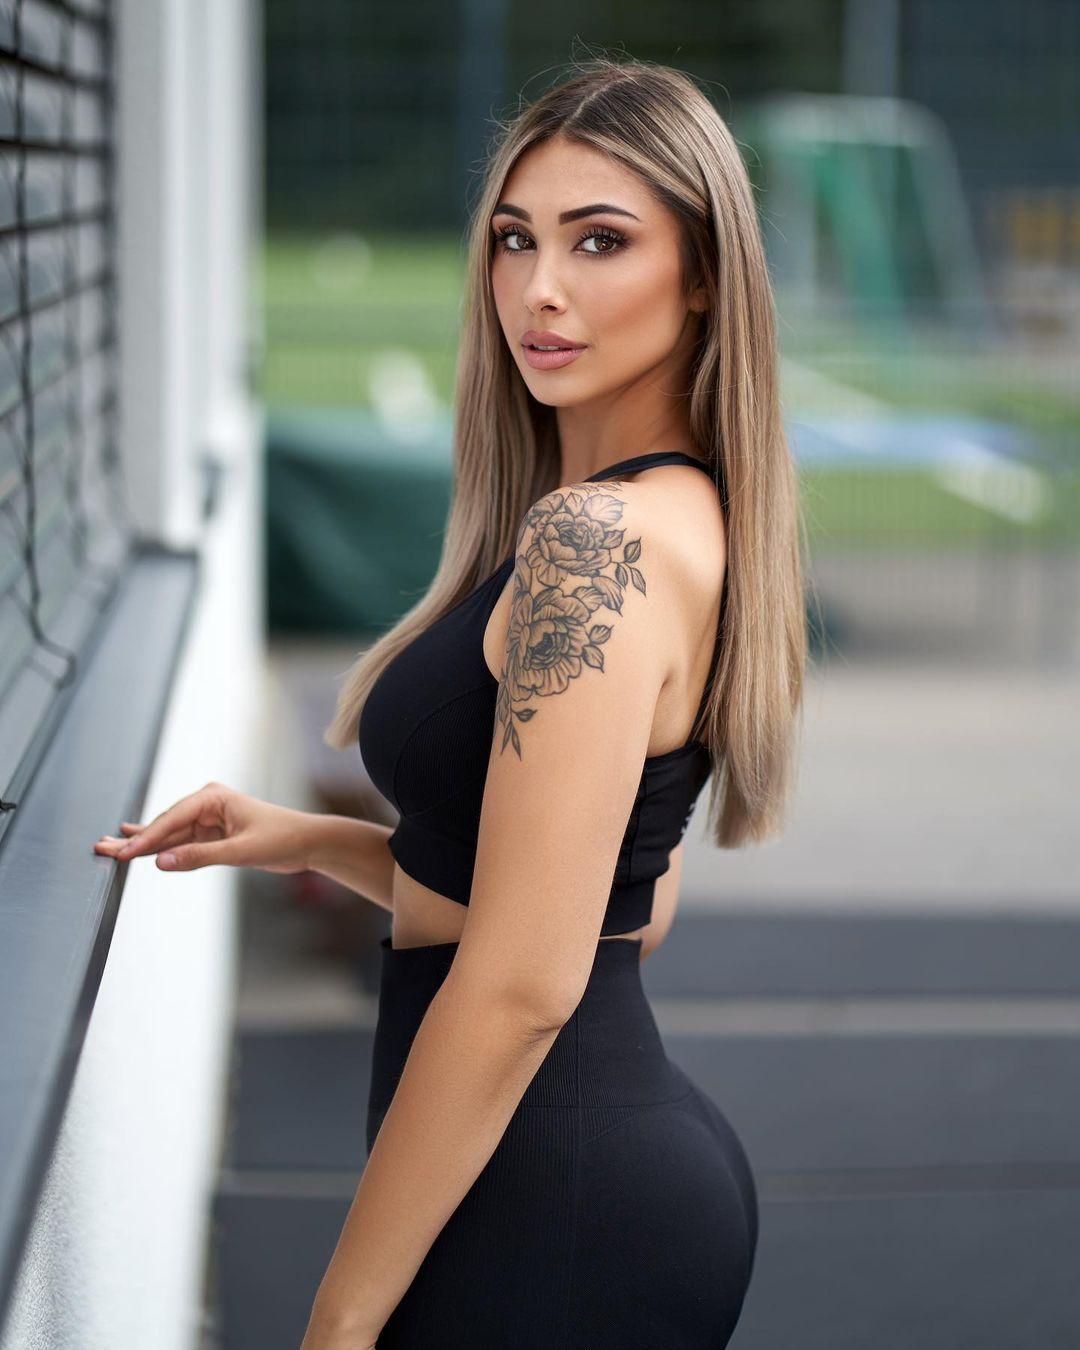 Celine-Lara-Sophie-Wallpapers-Insta-Fit-Bio-Celine-Bretz-Wallpapers-Insta-Fit-Bio-6